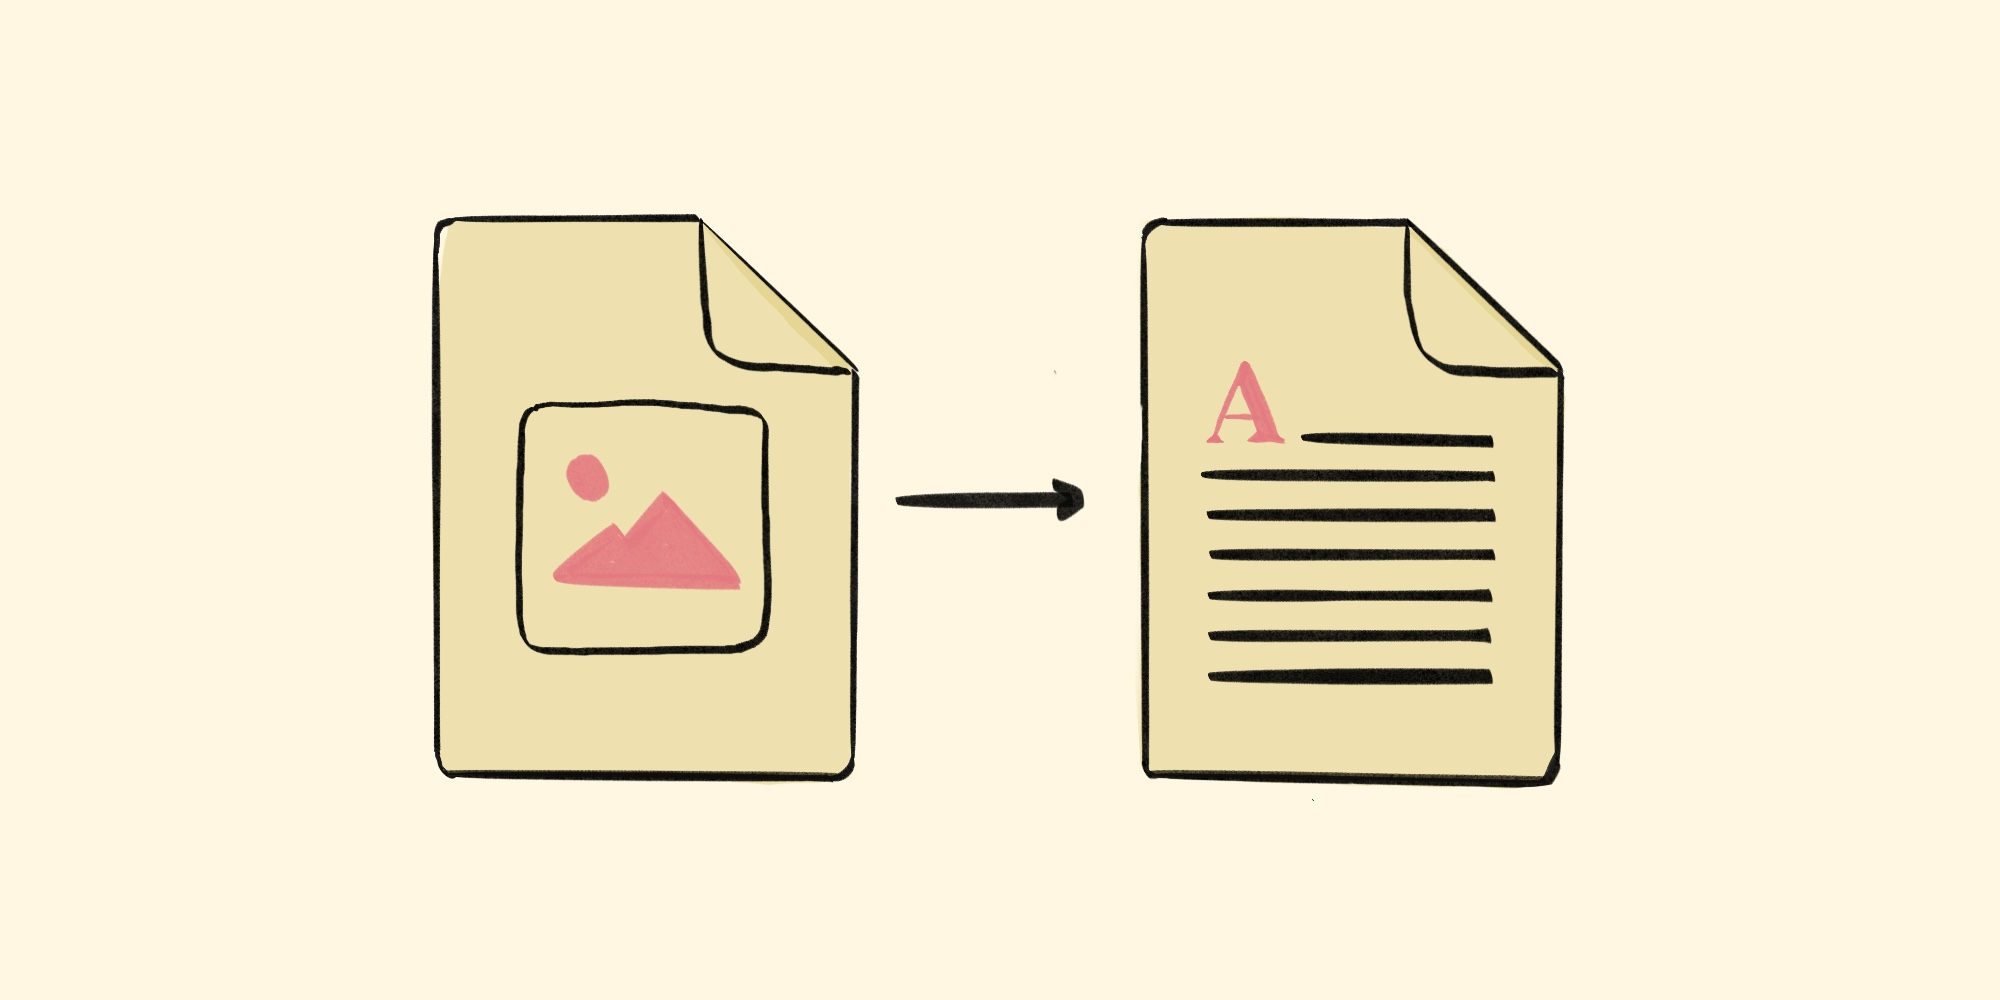 Tesseract.js: извлекаем текст из картинок с помощью JavaScript